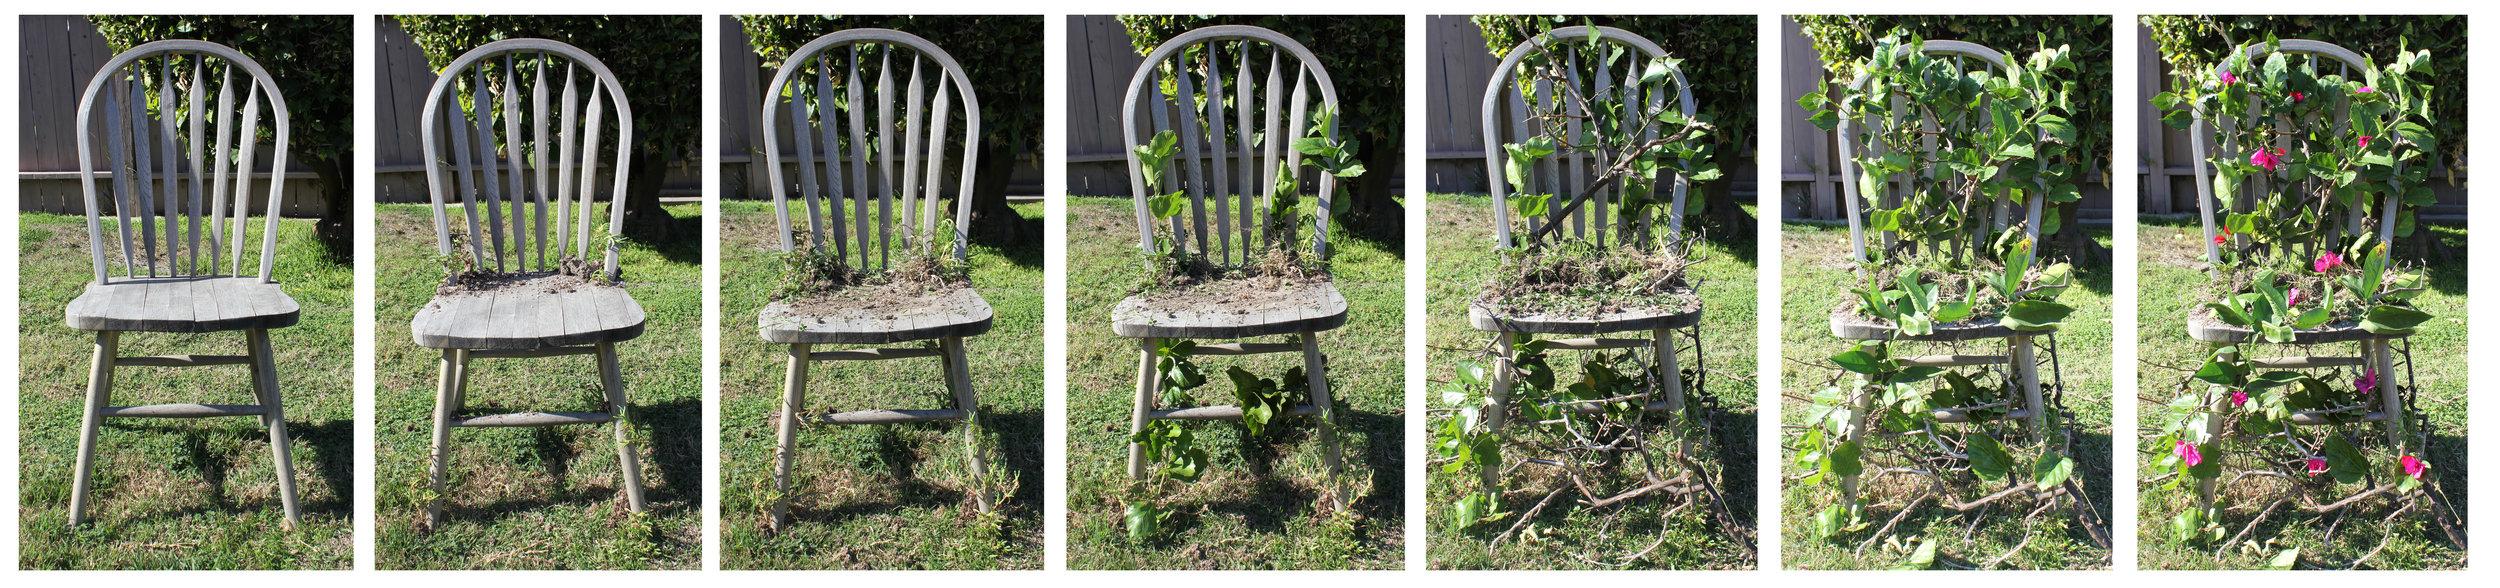 chair progression.jpg